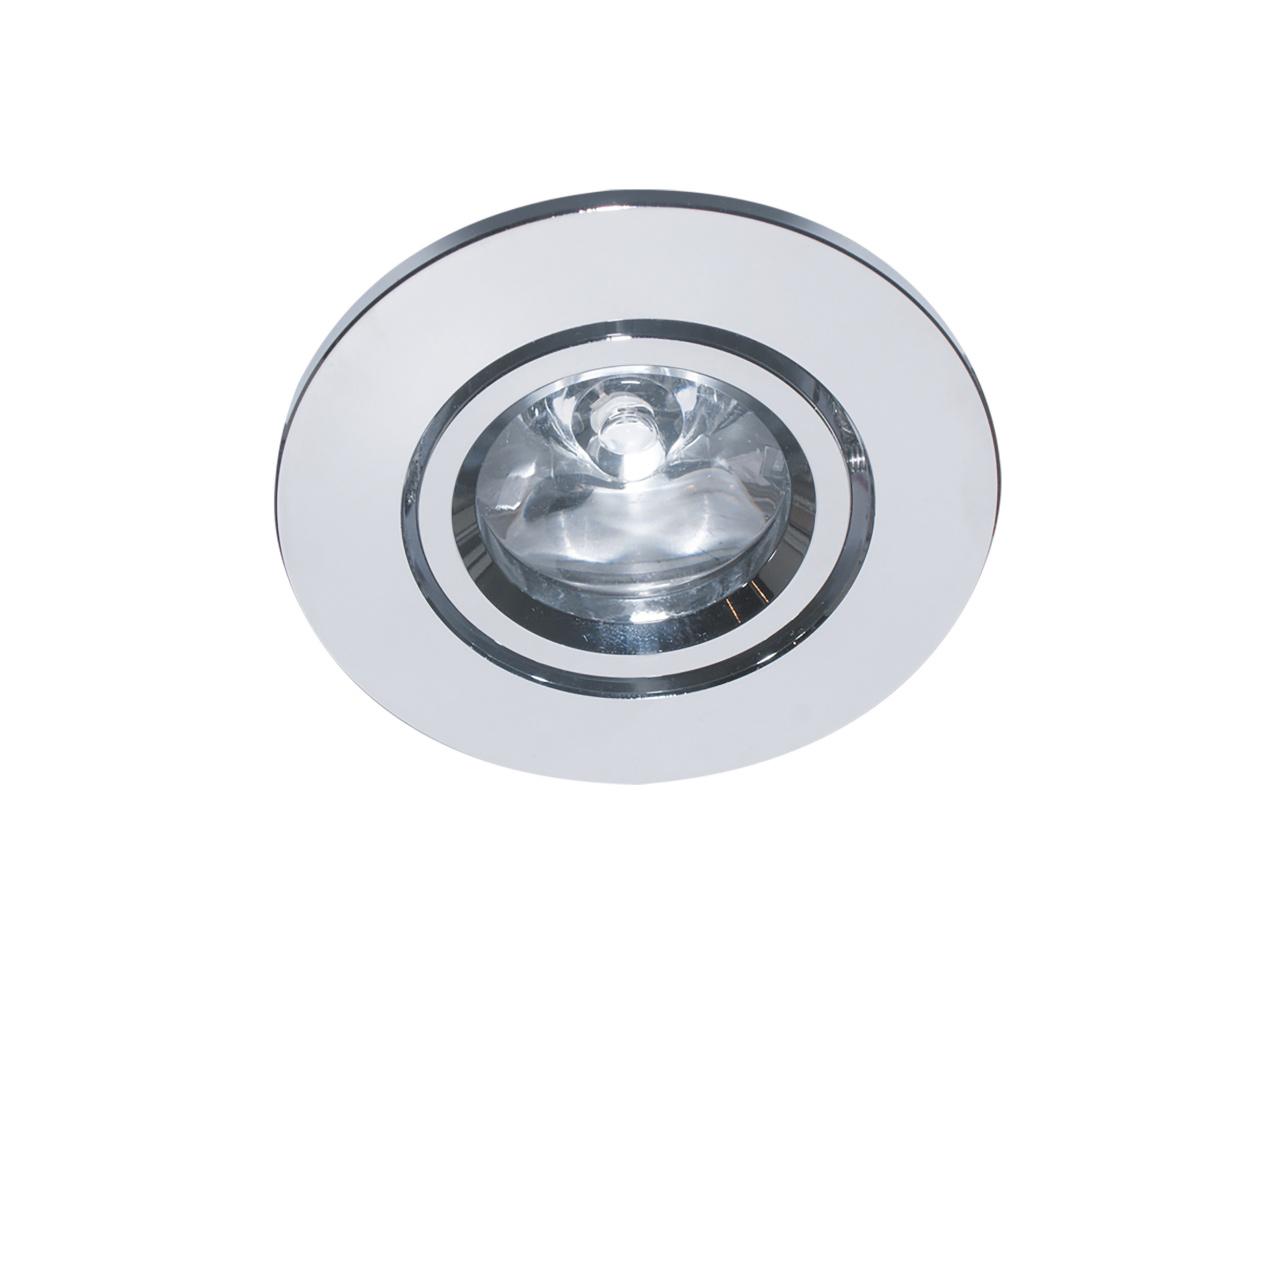 Светильник Acuto LED 1W 90LM хром 4000K Lightstar 070014